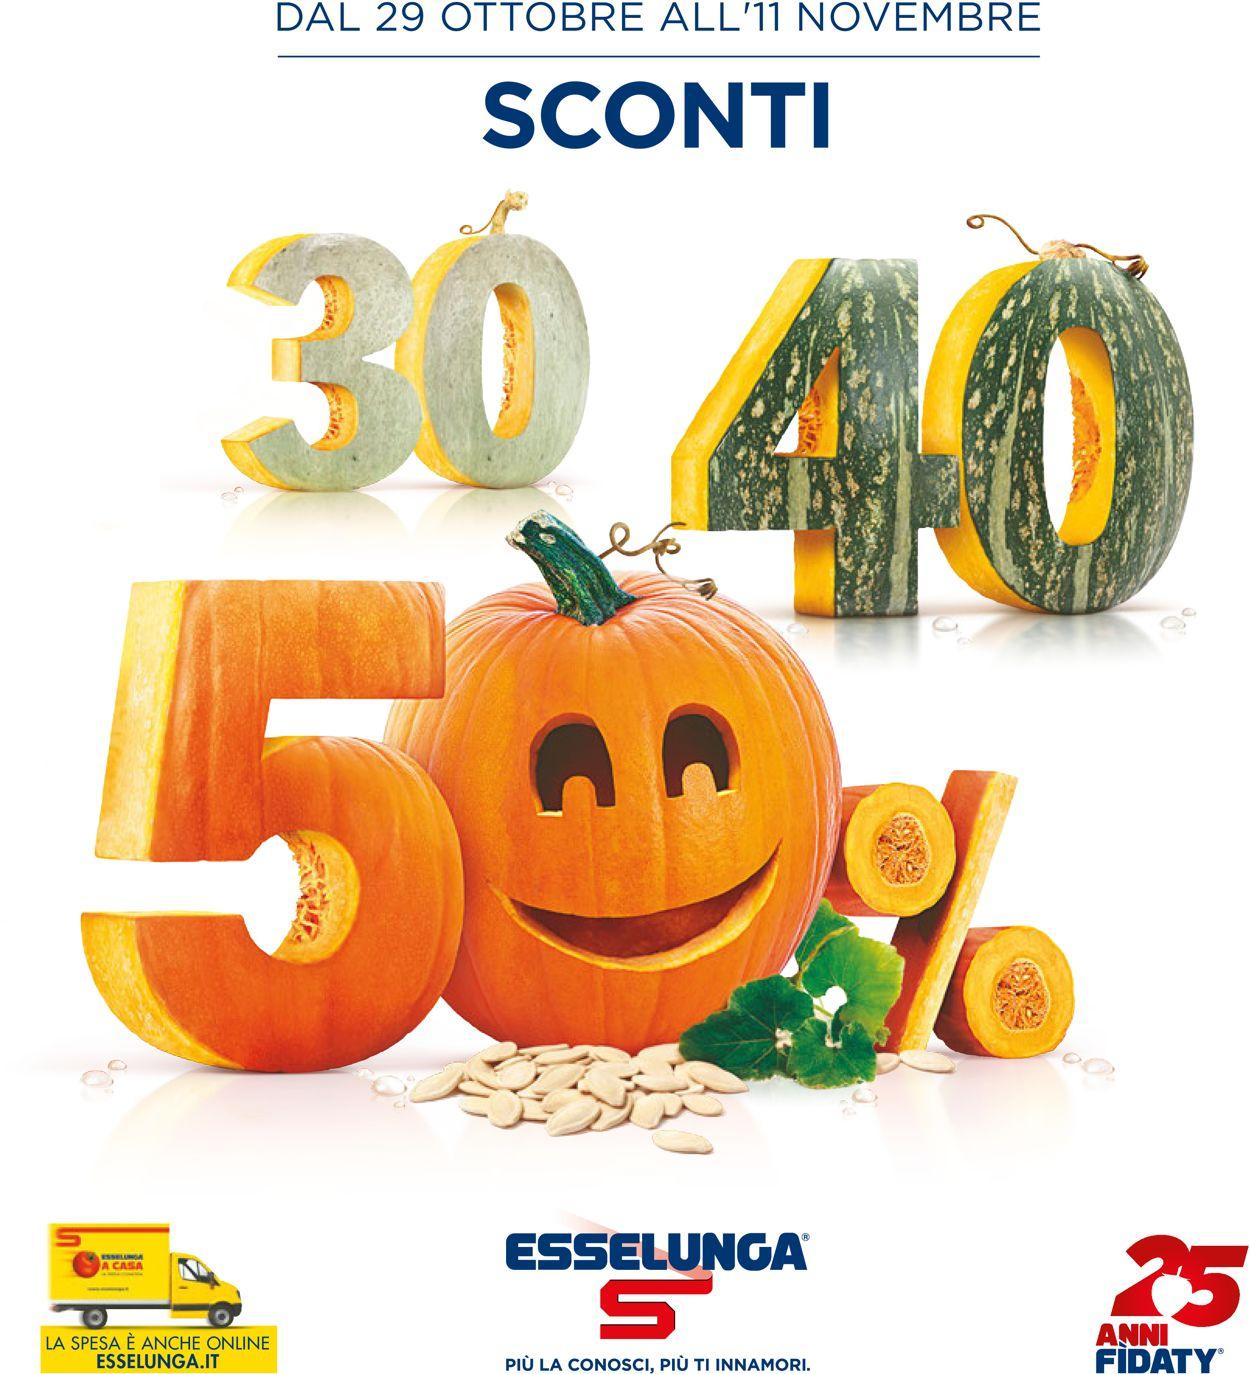 Volantino Esselunga - Offerte 29/10-11/11/2020